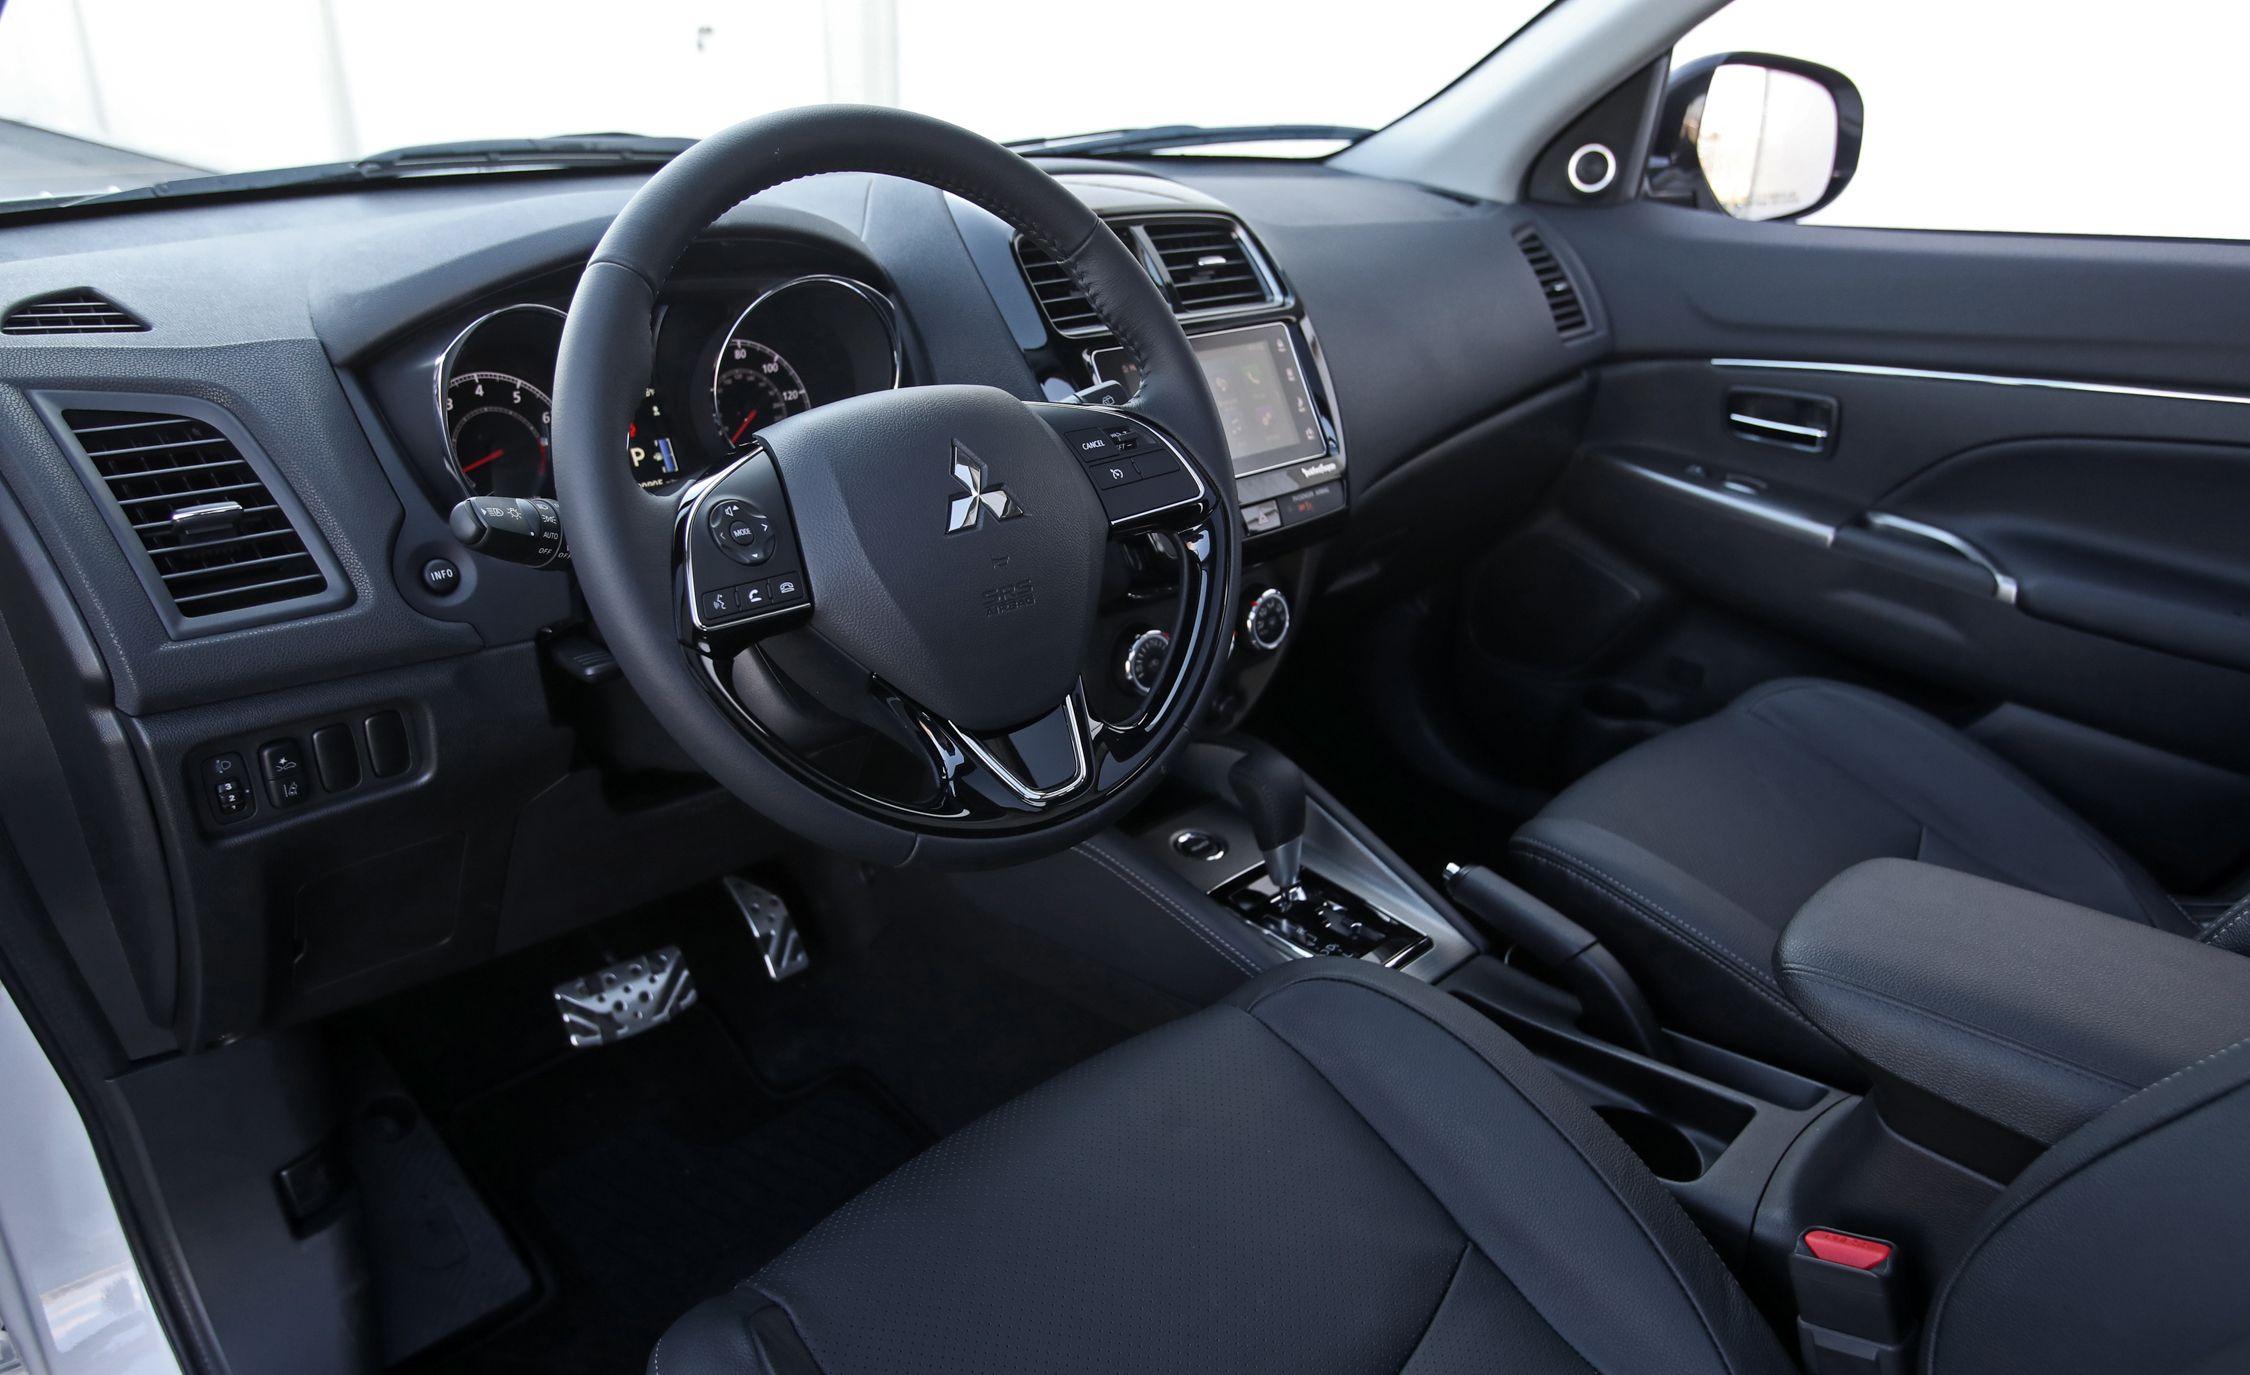 2020 Mitsubishi Outlander Sport Reviews Mitsubishi Outlander Sport